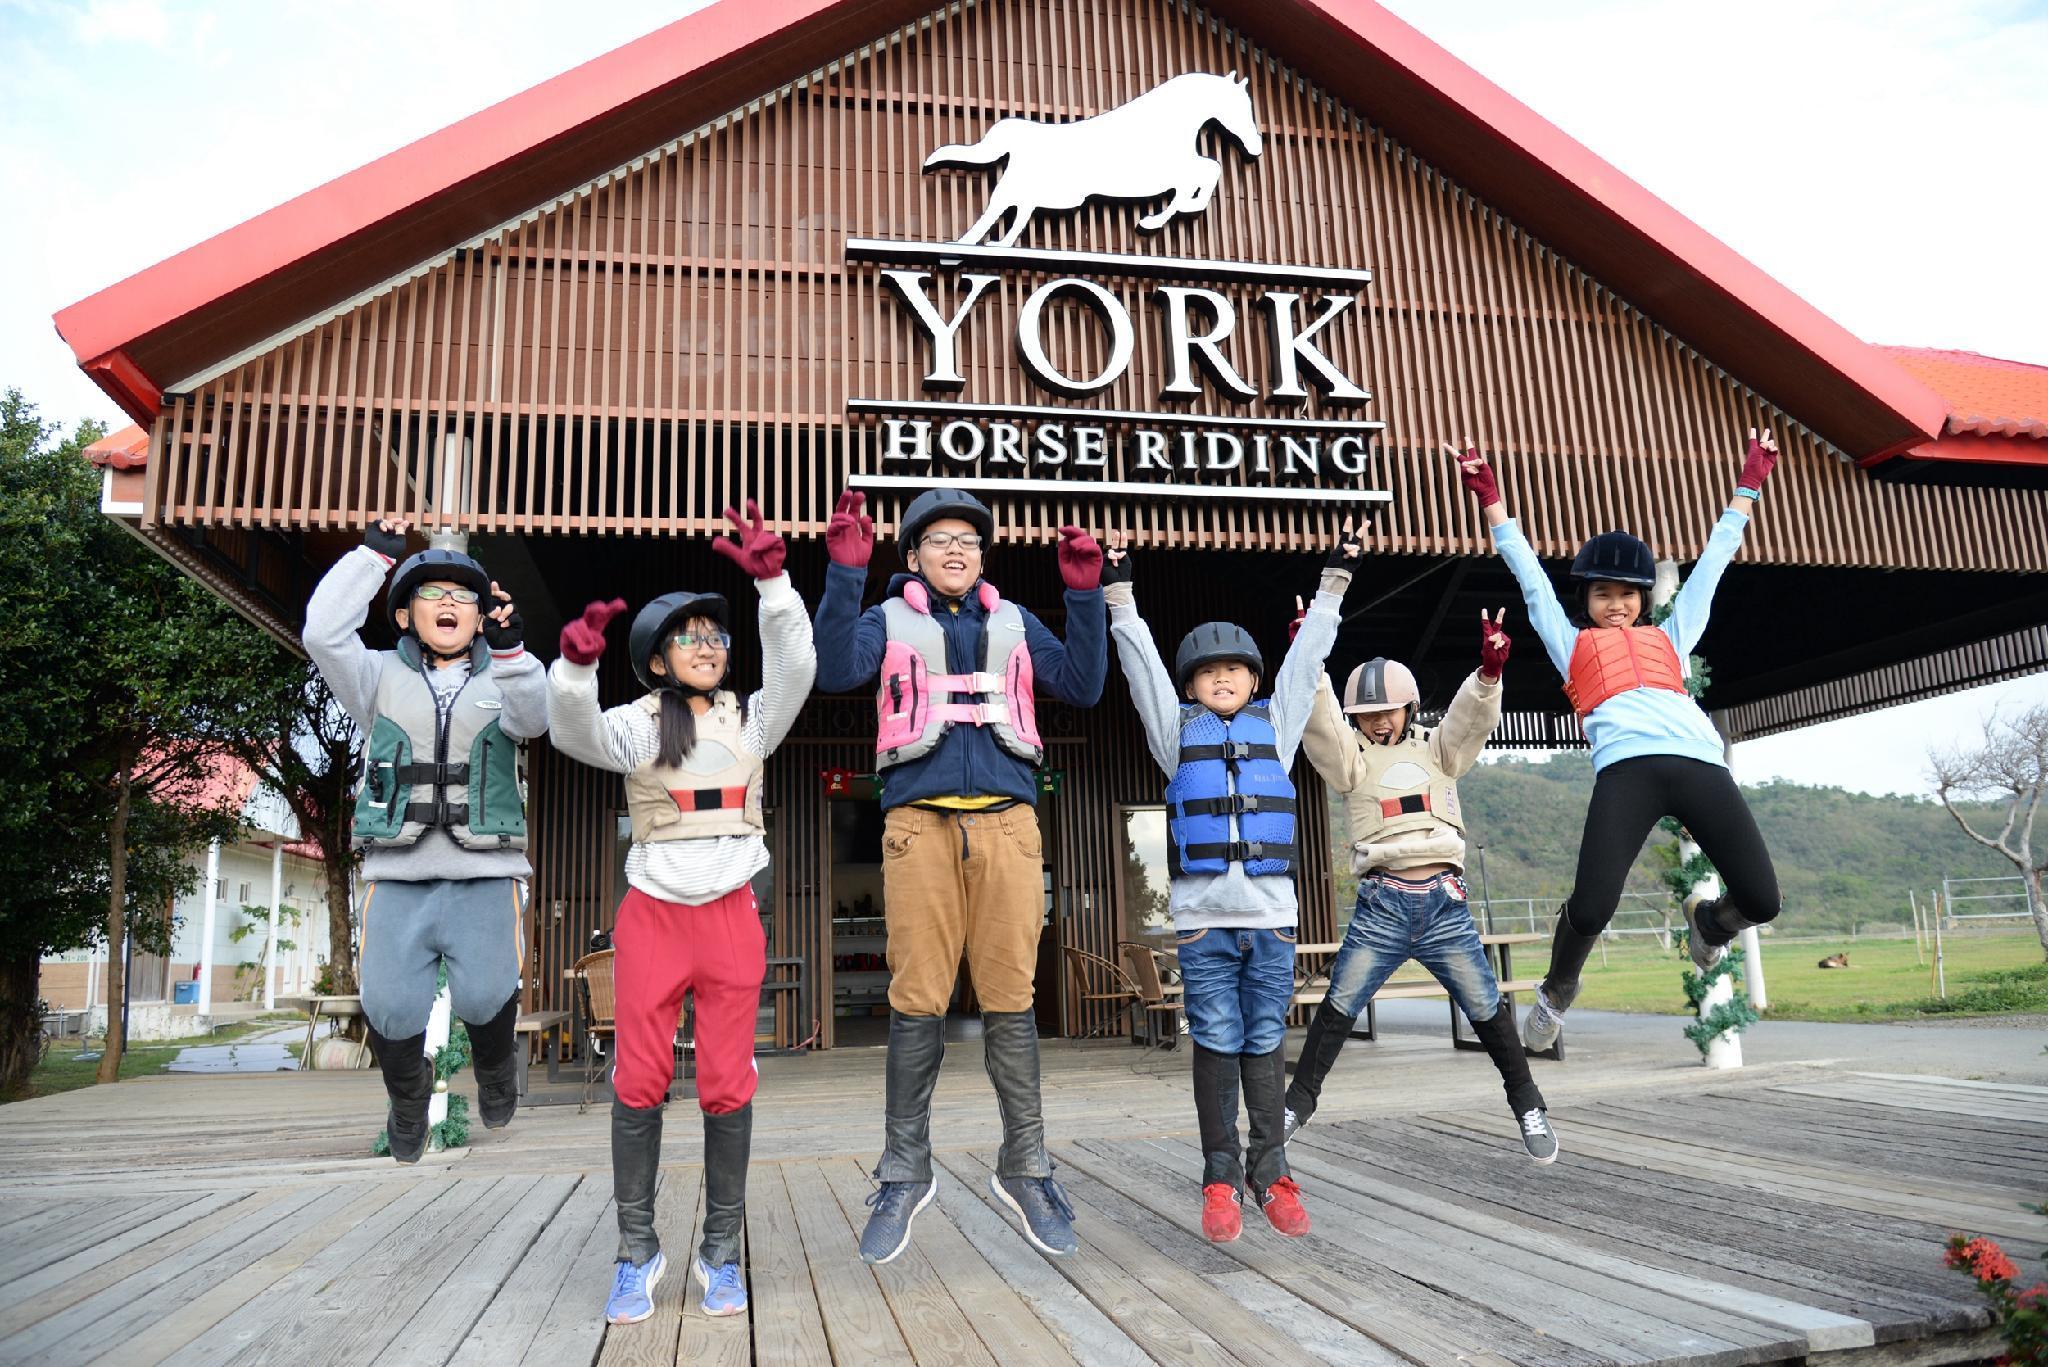 York Horse Riding Club